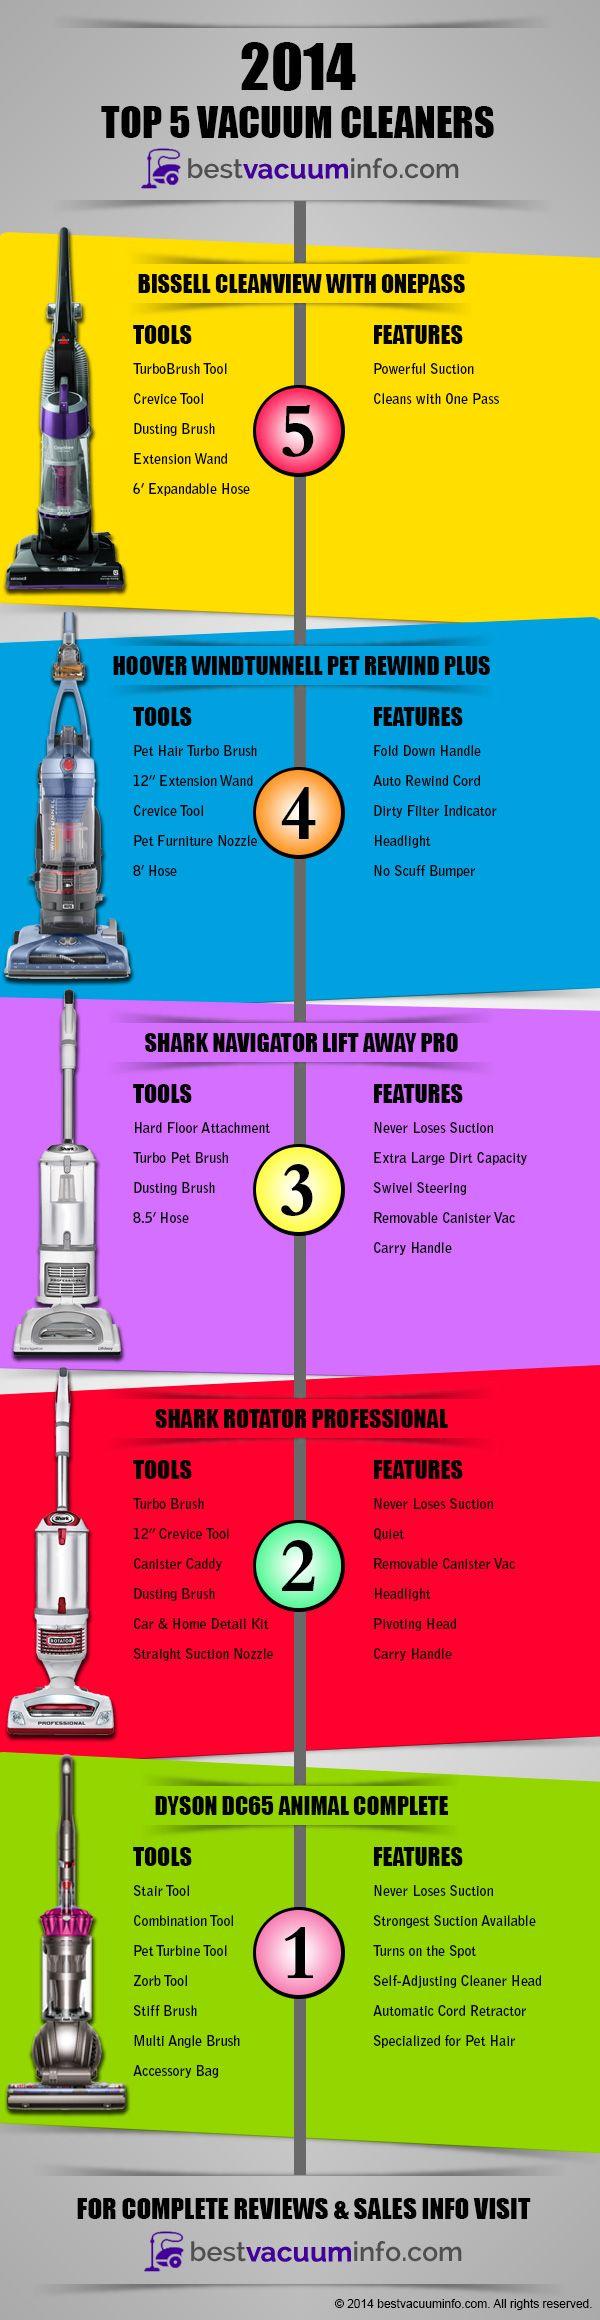 bestvacuuminfo.com Top 5 Best Vacuum Cleaners of 2014